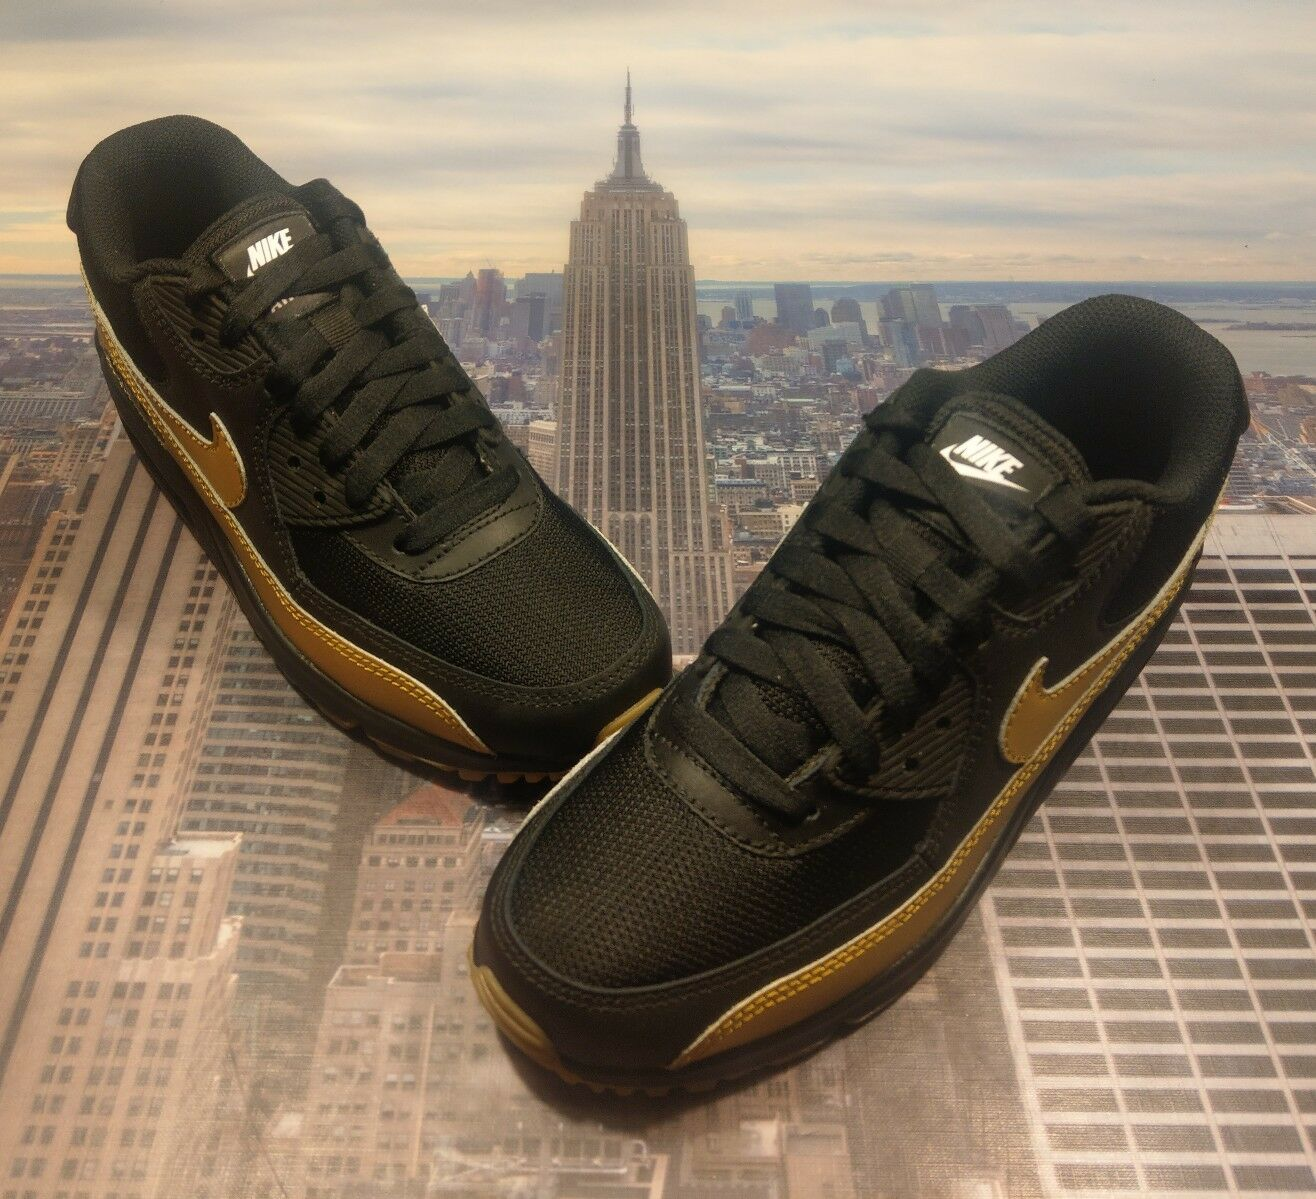 Nike iD Womens Air Max 90 Premium Black/Metallic Gold Size 7 931896 994 Wmns New